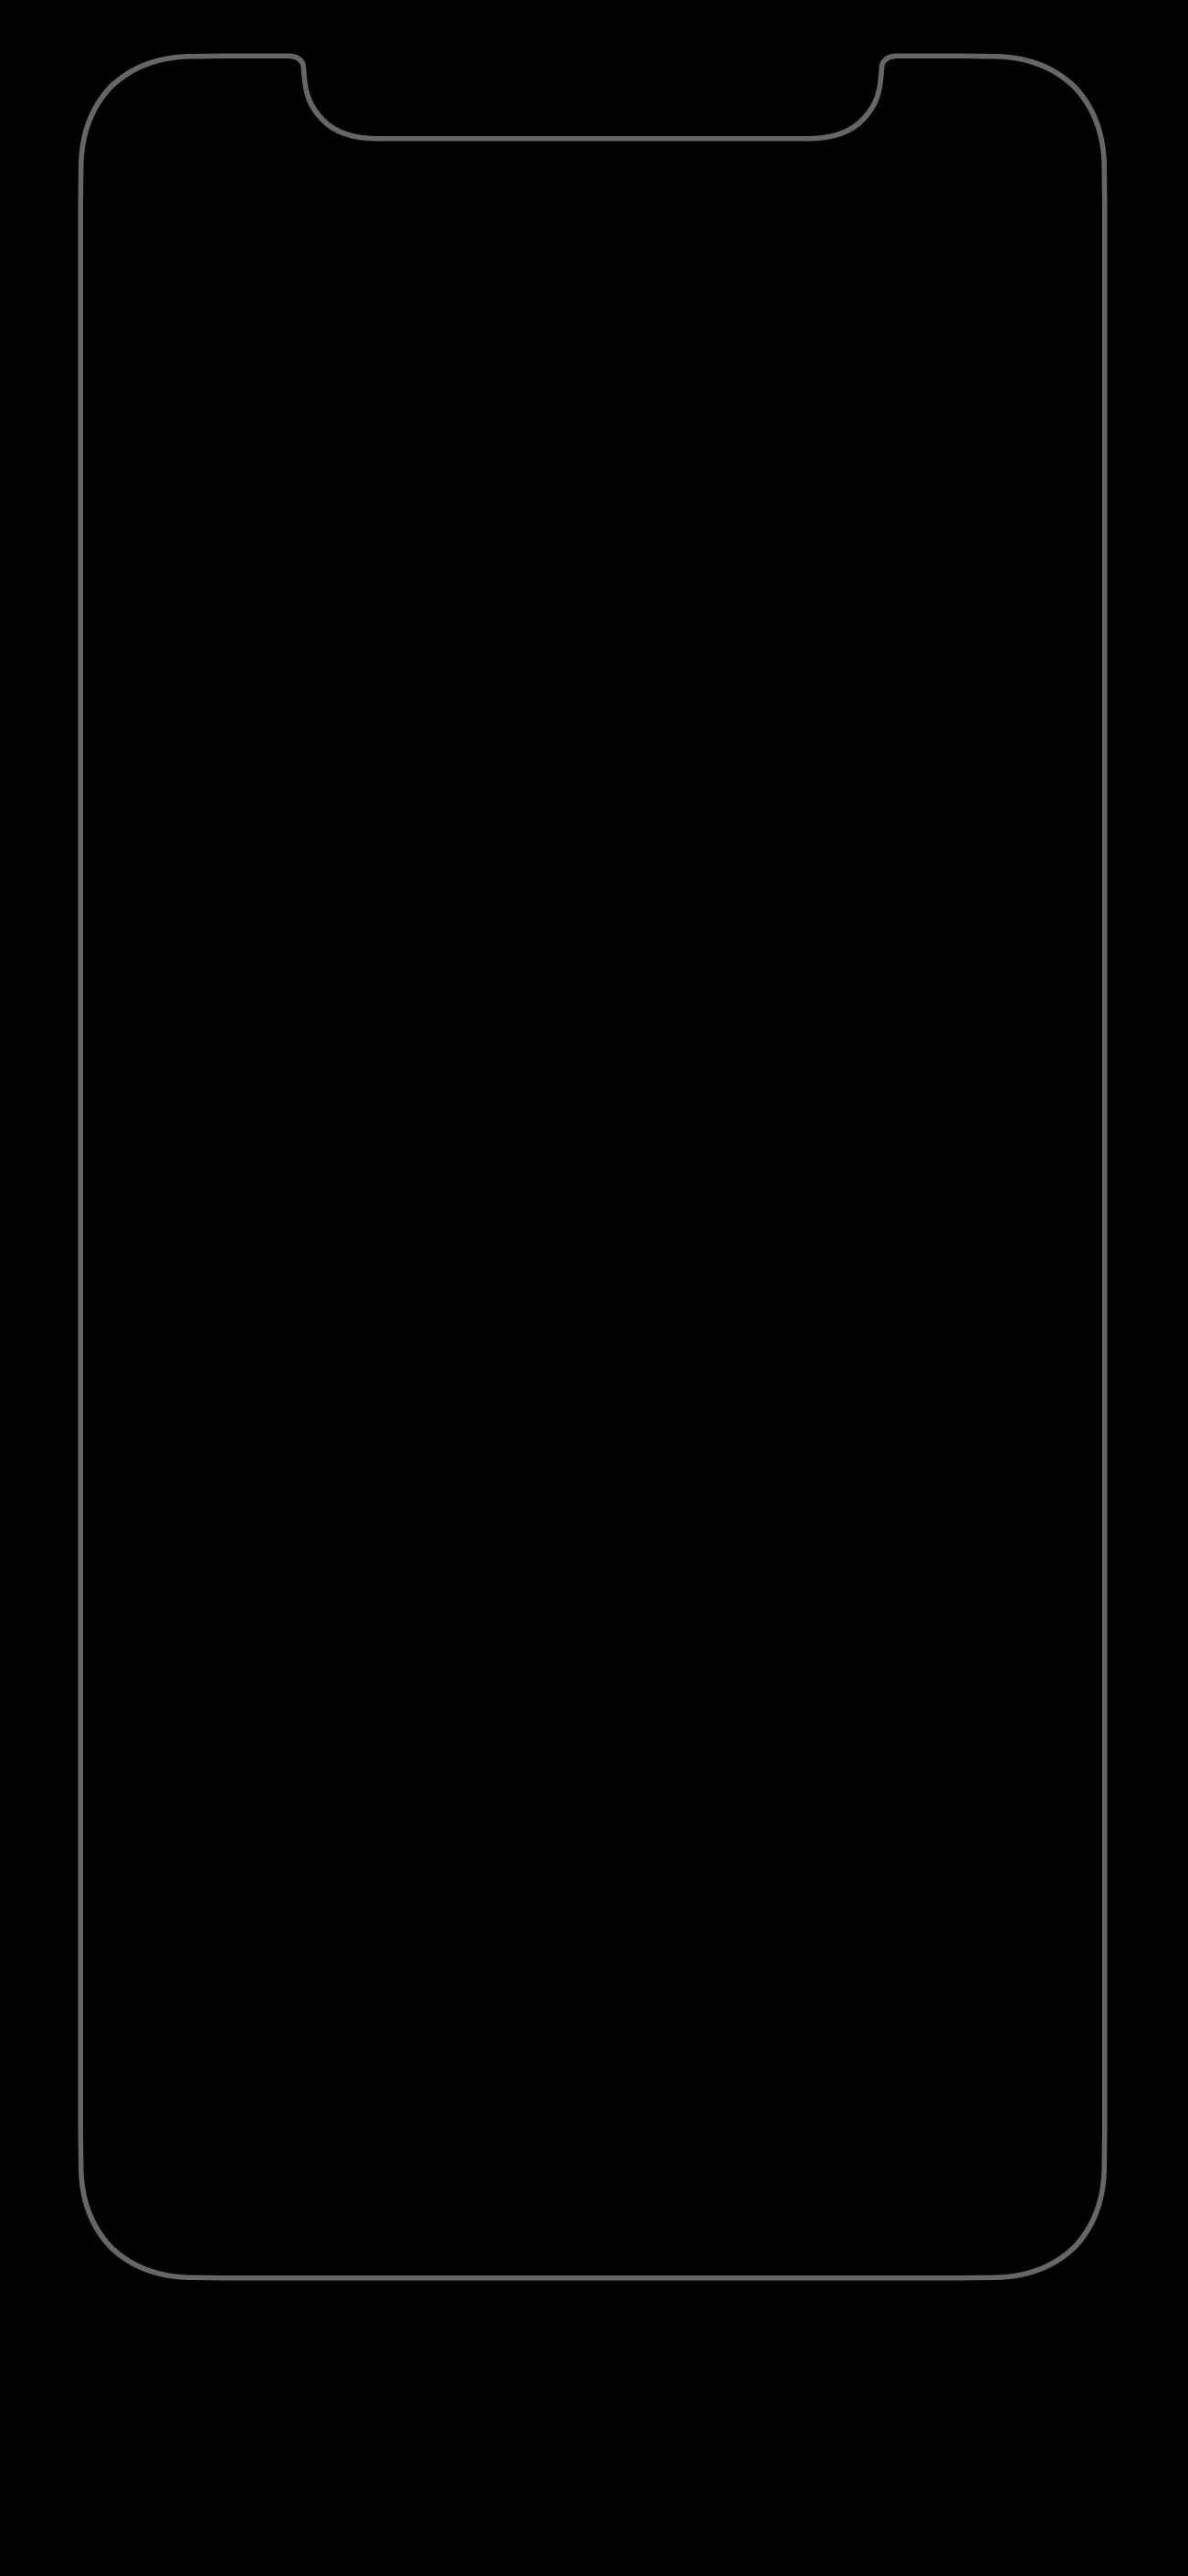 Pure Black Amoled Smartphone Wallpapers - Wallpaper Cave